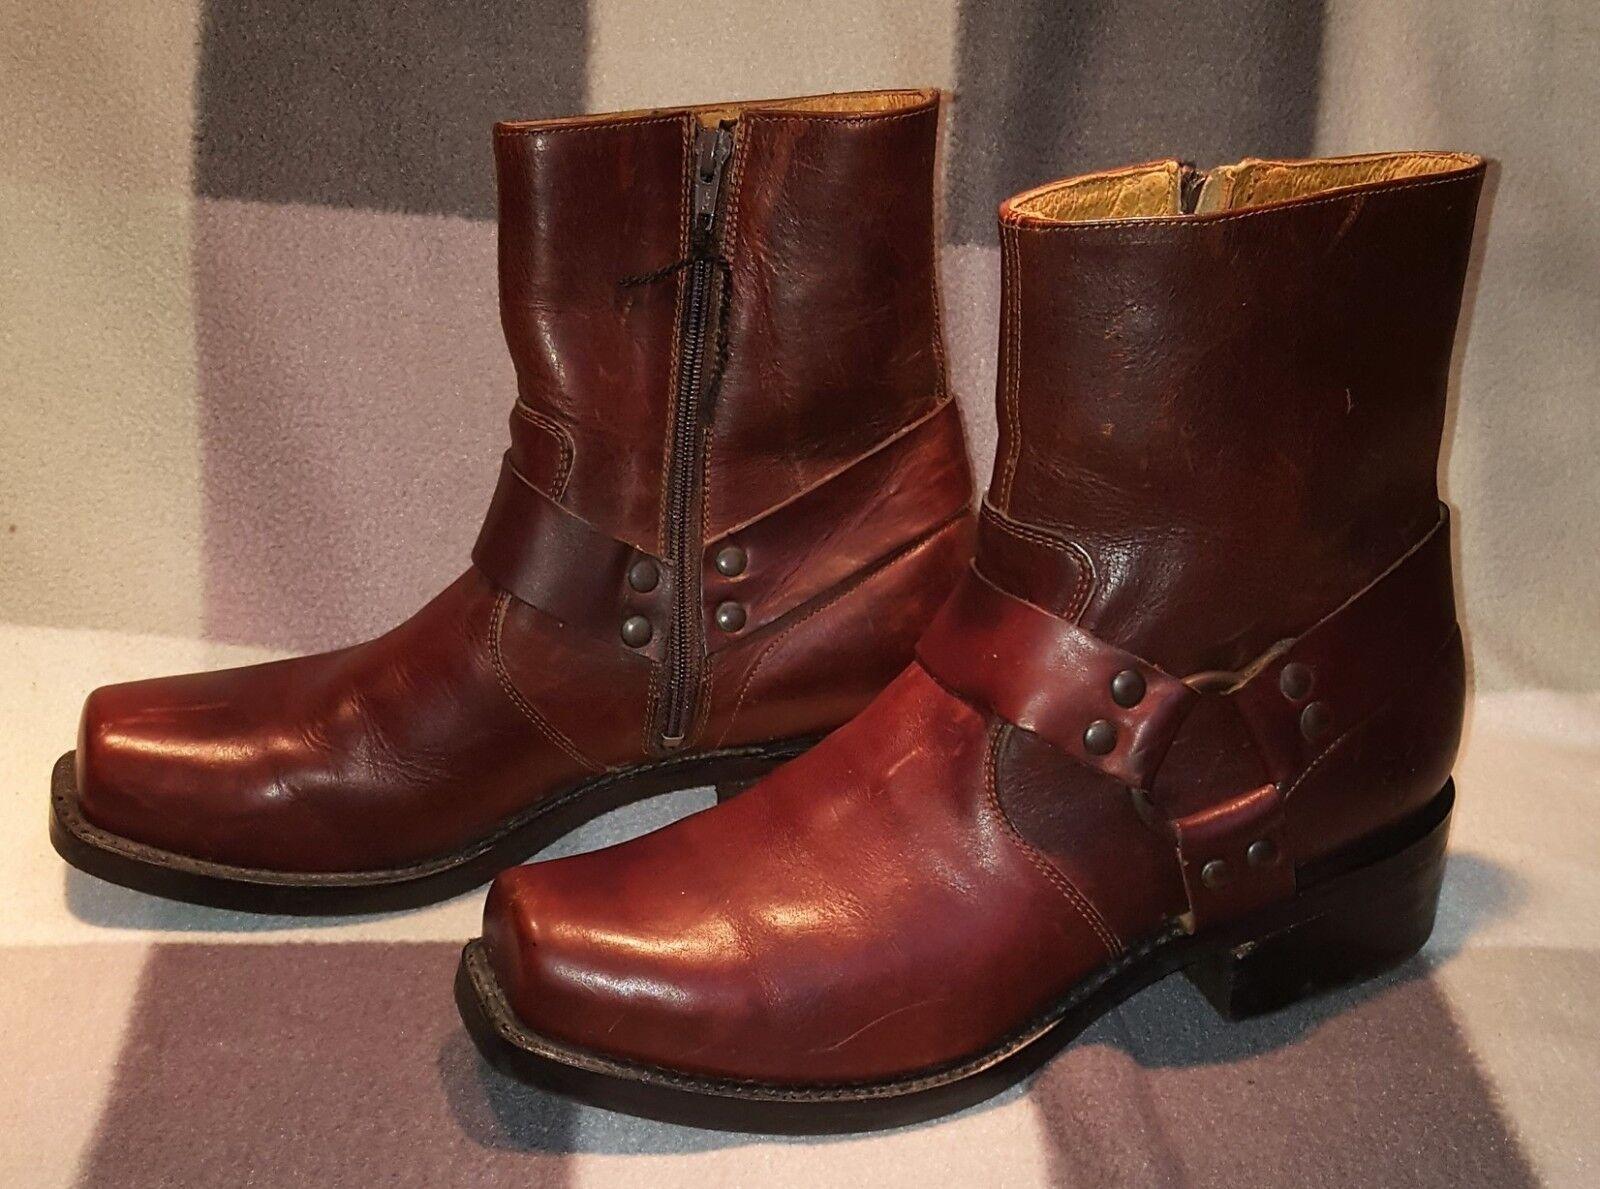 FRYE boots Cowboy Stiefel / Stiefelletten made in Mexico Maße Größe etc. s. scan